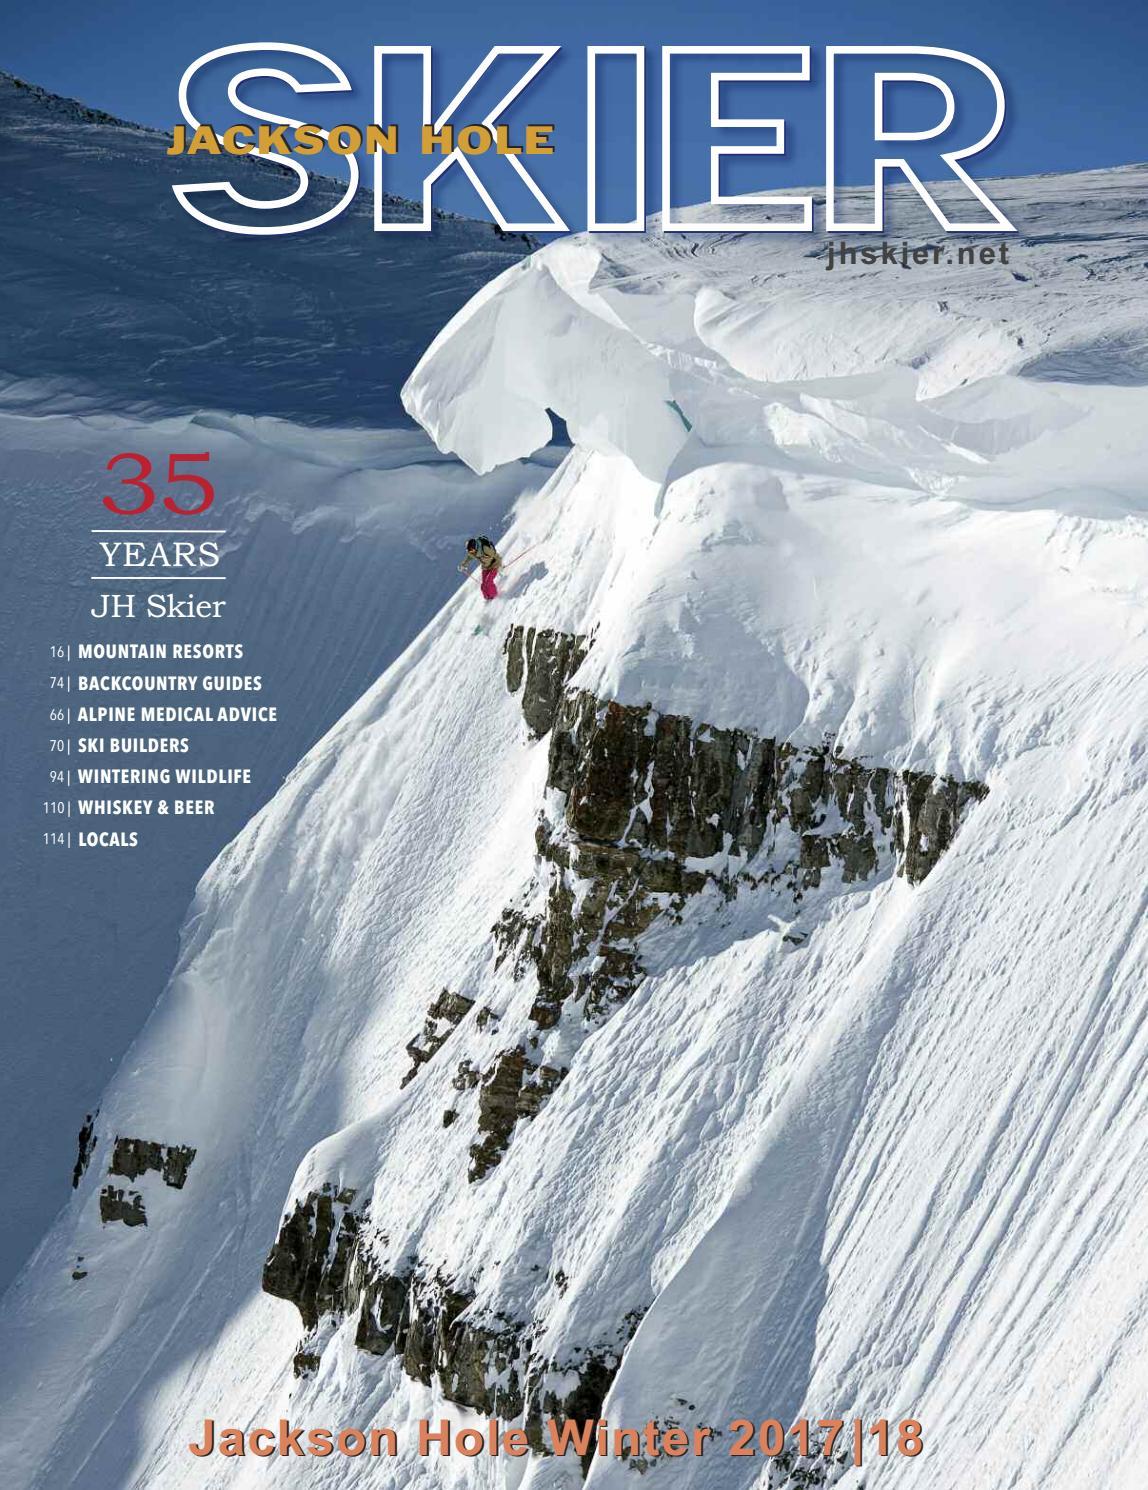 Jackson Hole Skier Magazine 2018 by Bob Woodall - issuu d7c64ad42